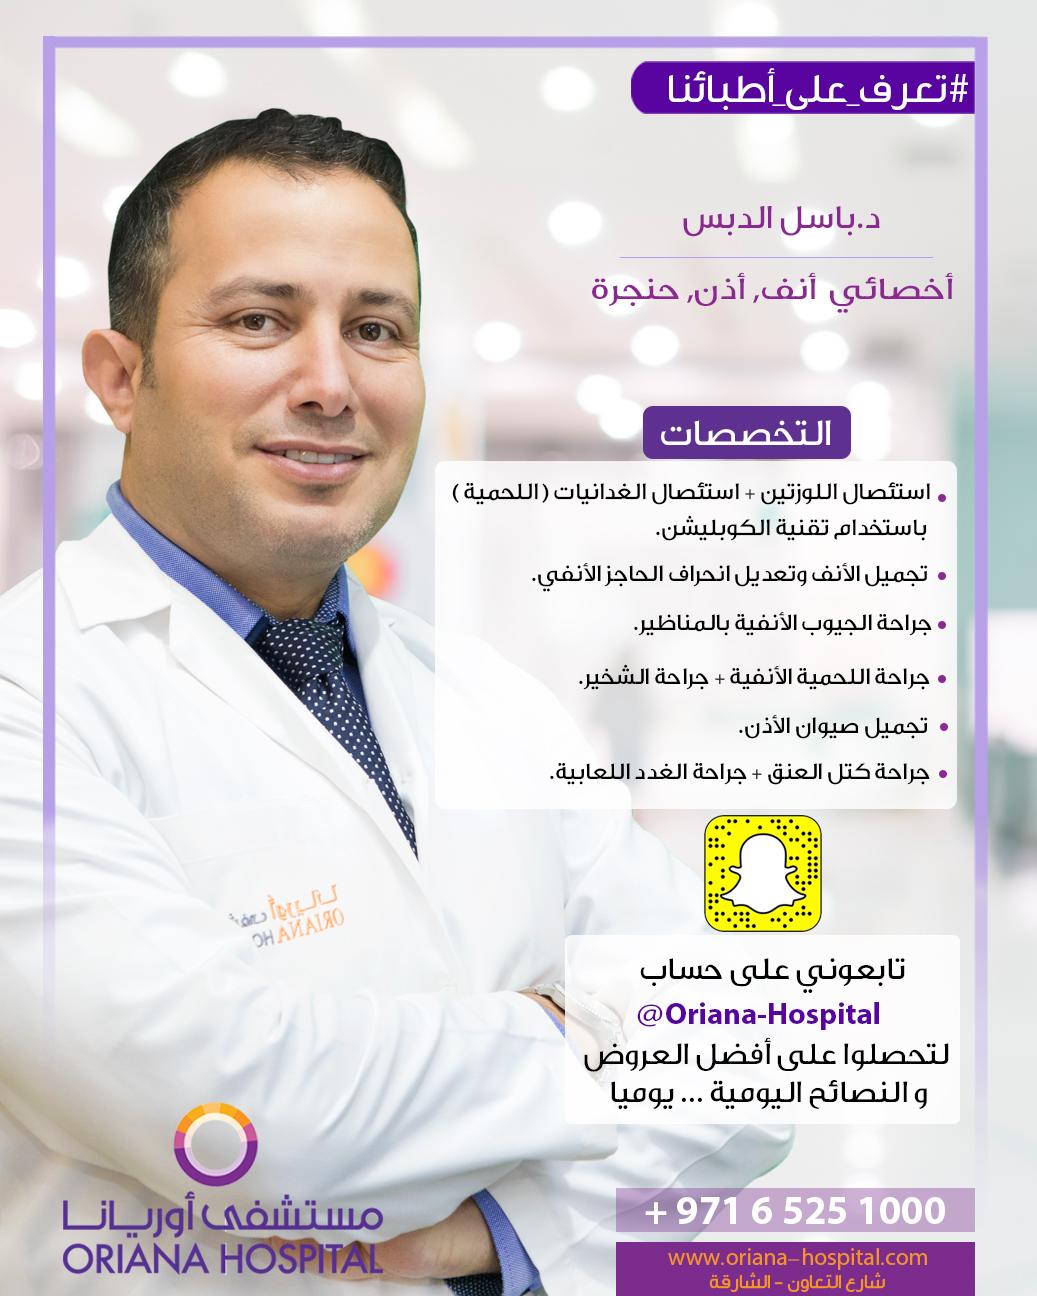 dr basil arabic copy